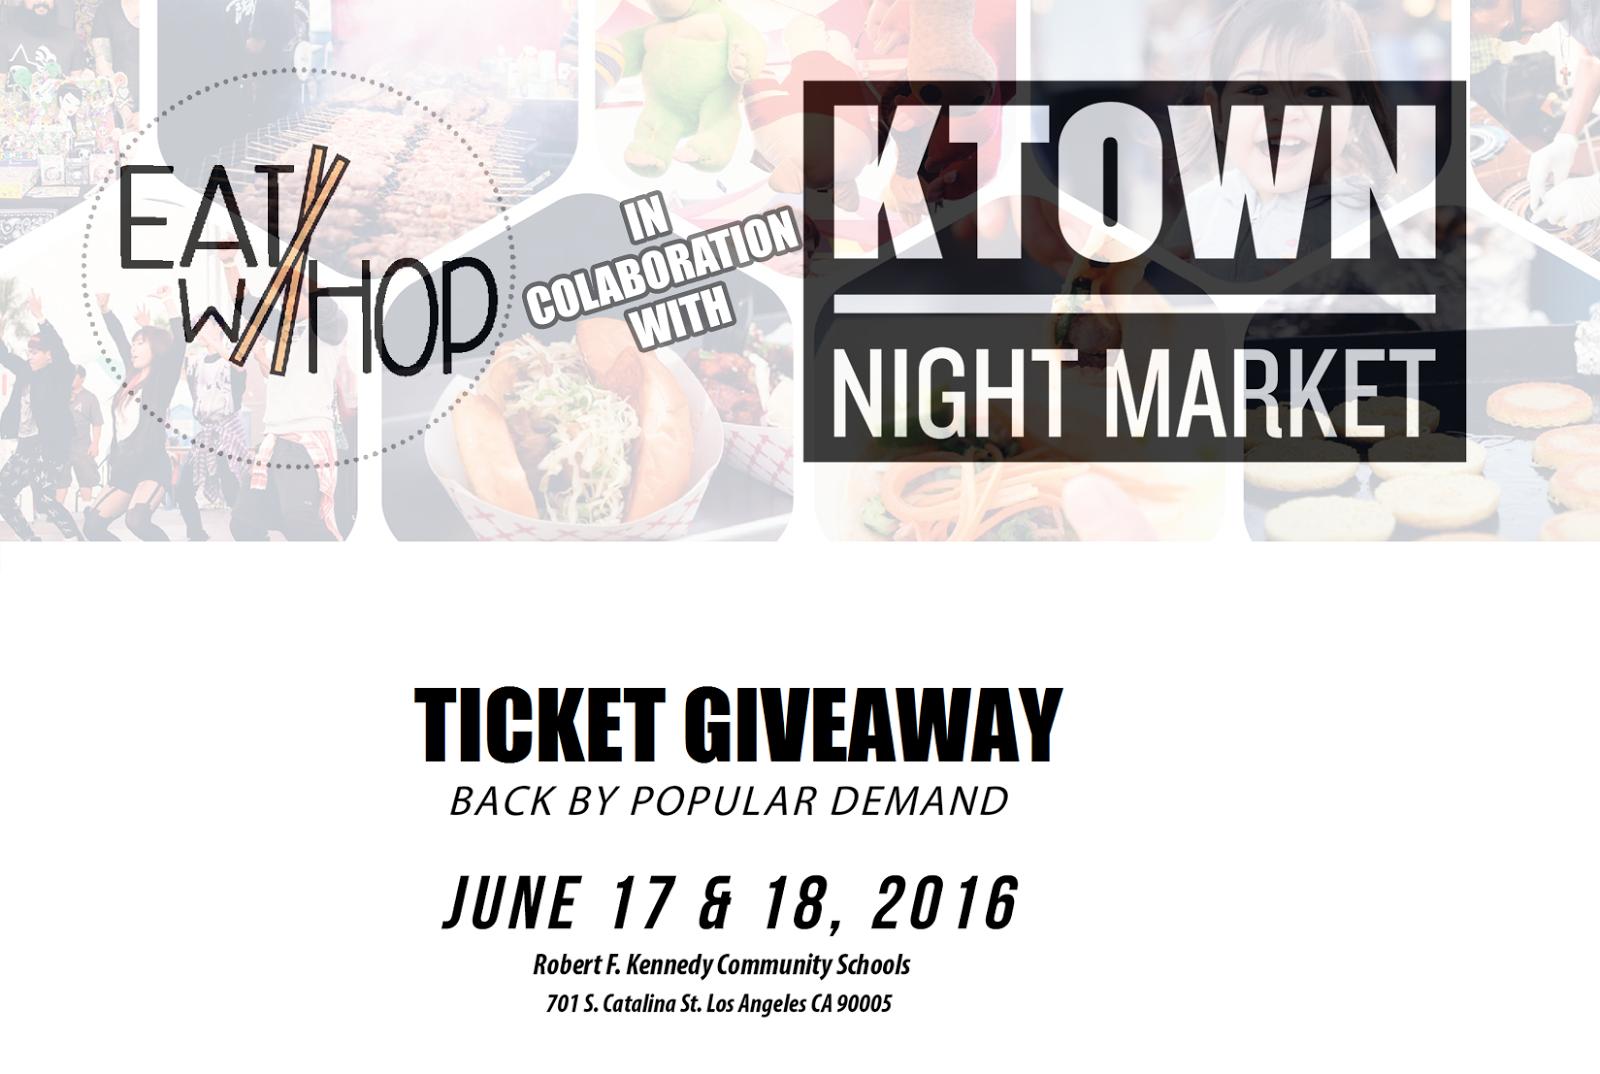 KTOWN NIGHT MARKET IS BACK BY POPULAR DEMAND JUNE 17-18 (TICKET GIVEAWAY)